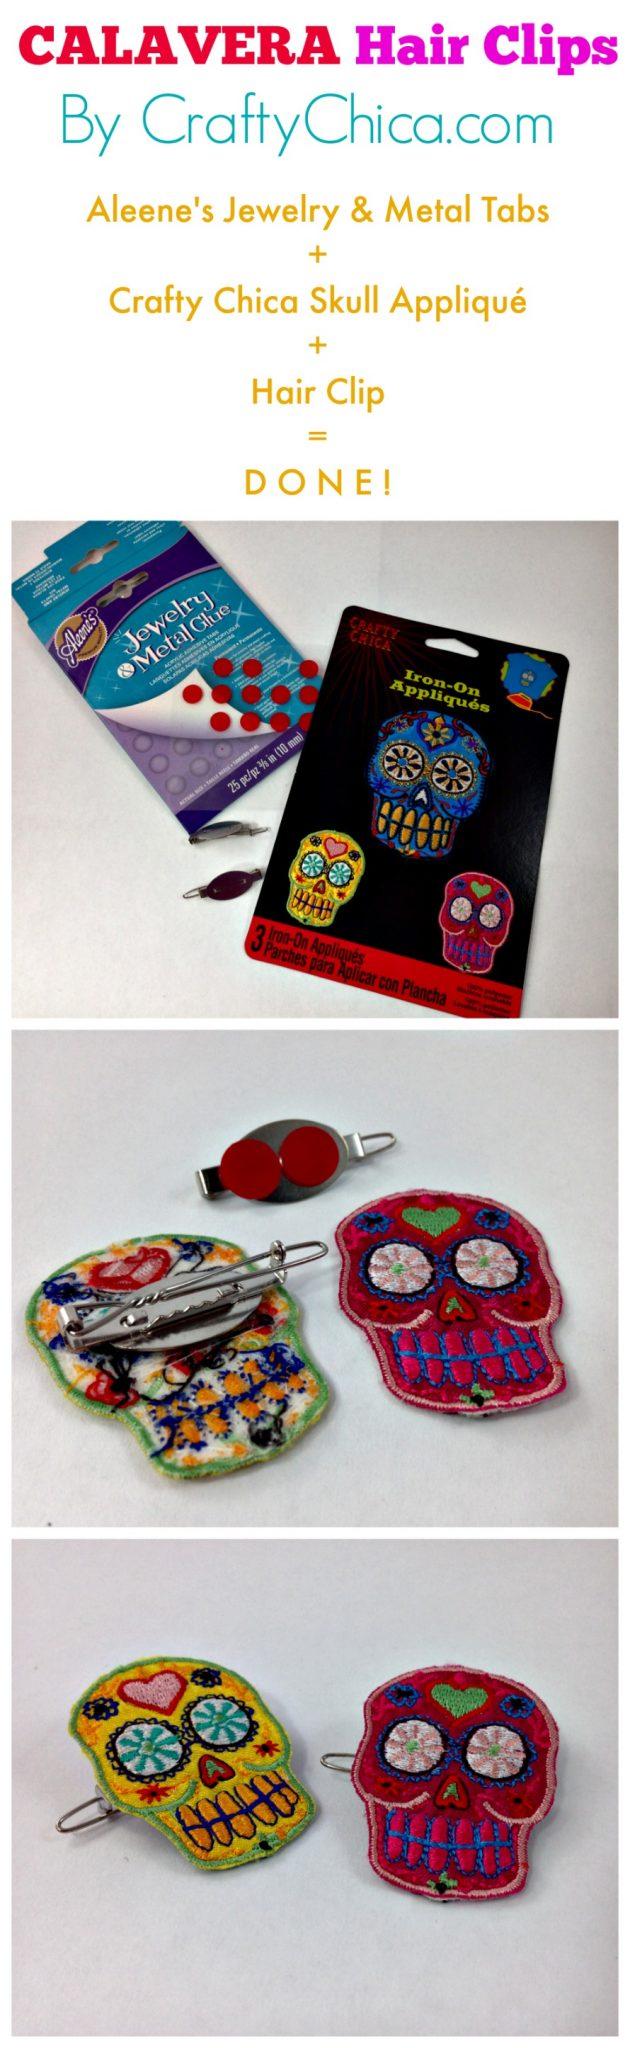 By CraftyChica.com using Crafty Chica skull appliqués.